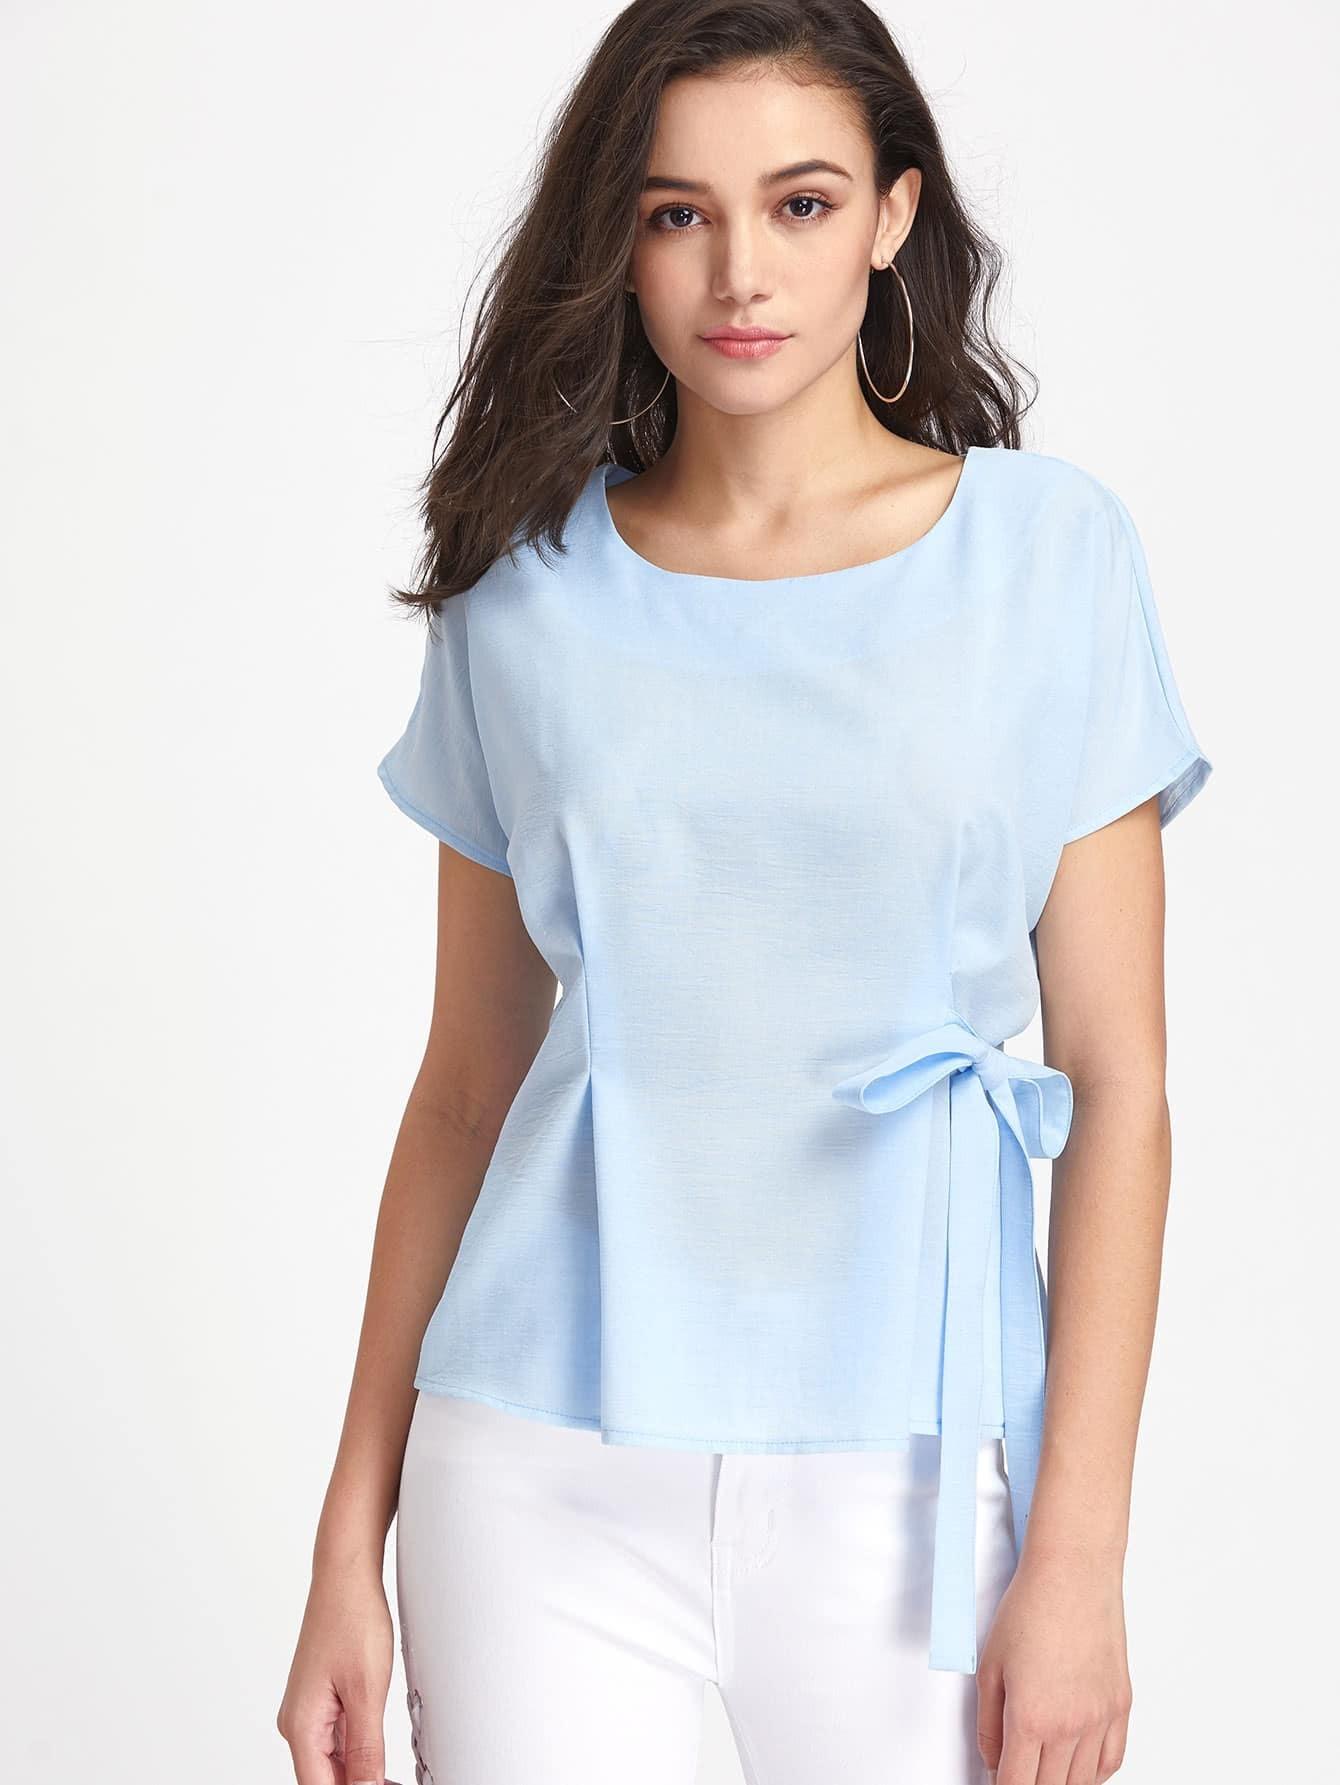 blouse170519105_2